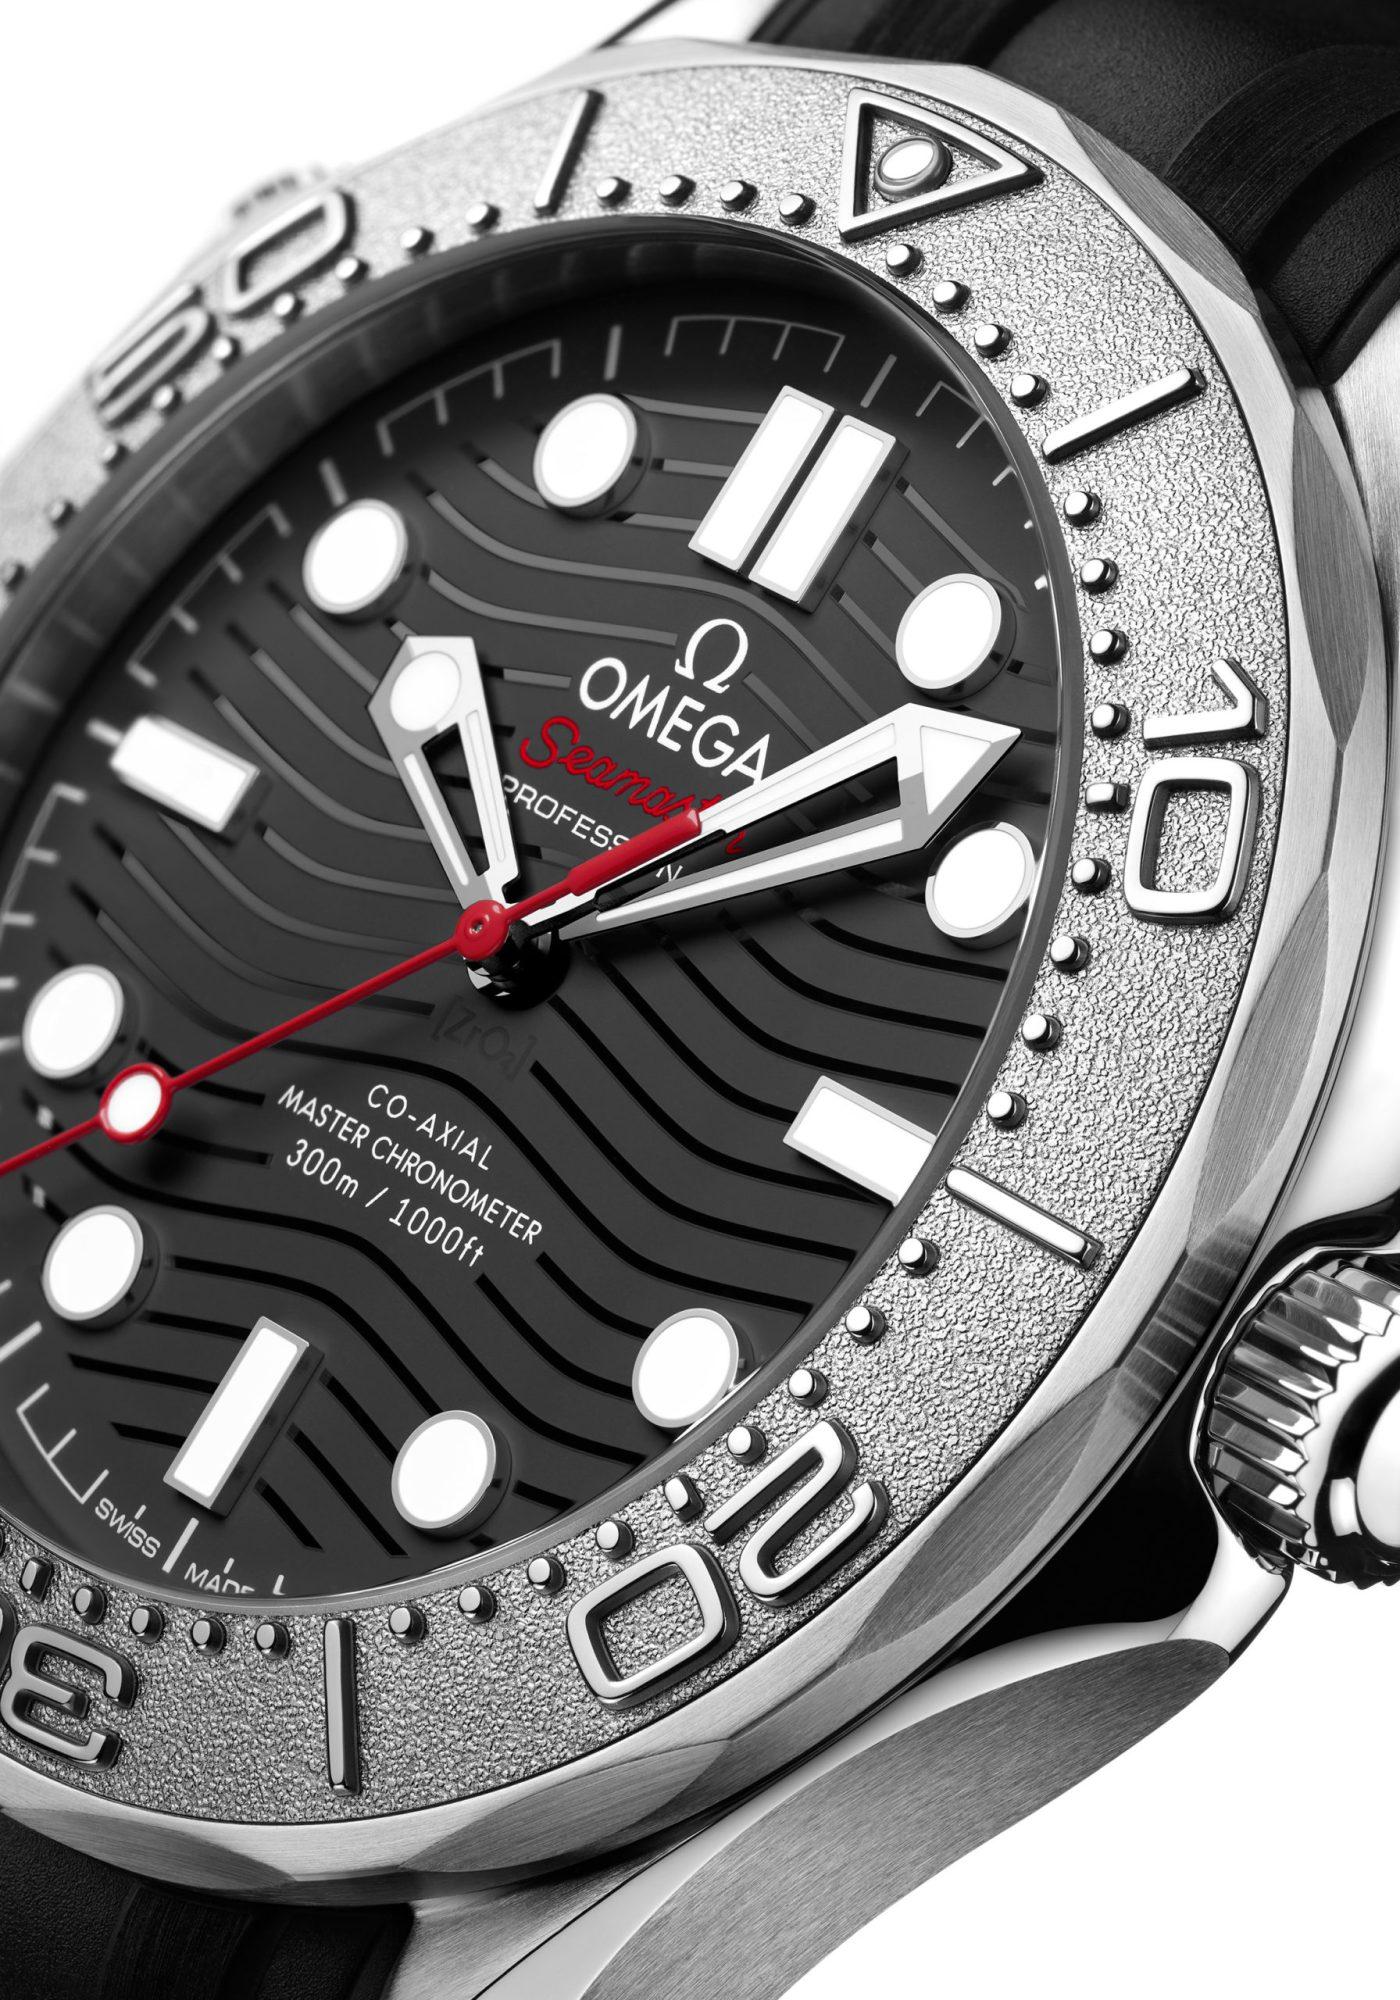 Omega Seamaster Diver 300M Nekton Edition close up dial